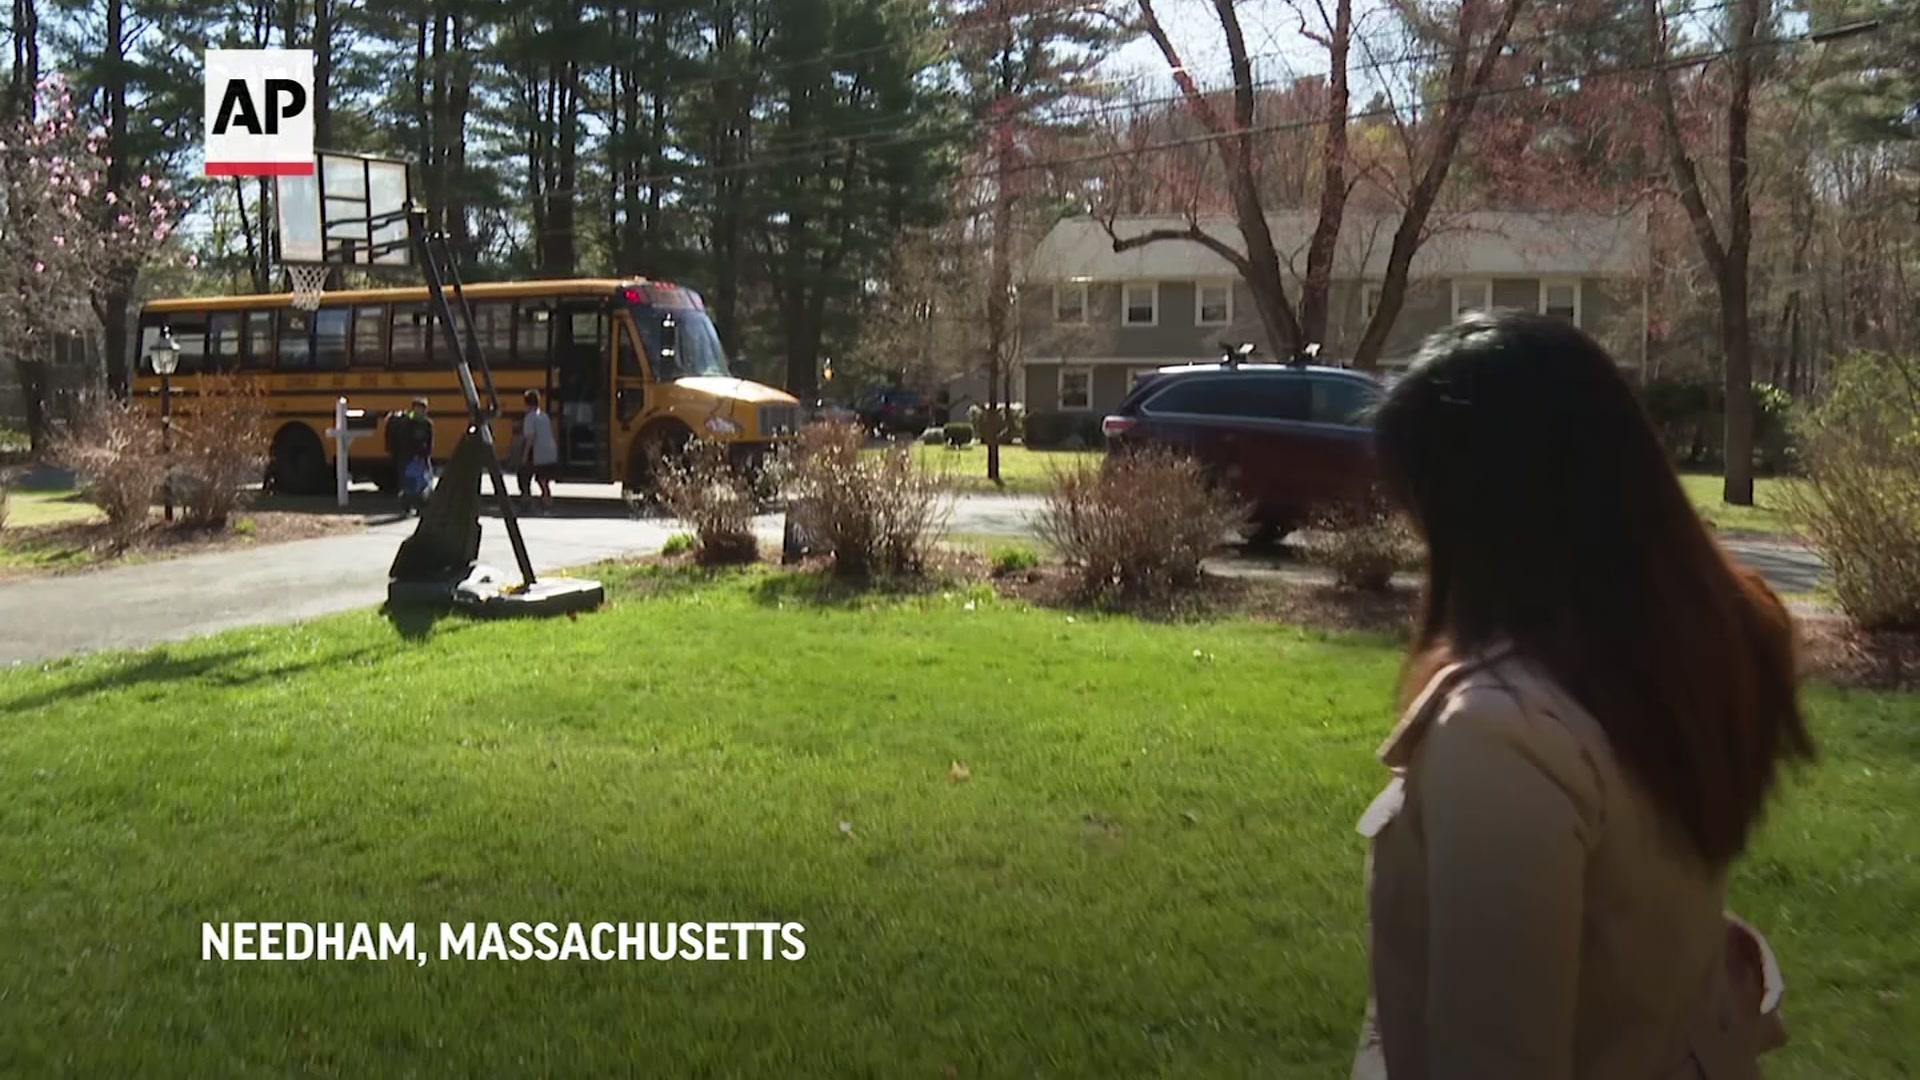 news.yahoo.com: Asian families wary about school return amid virus